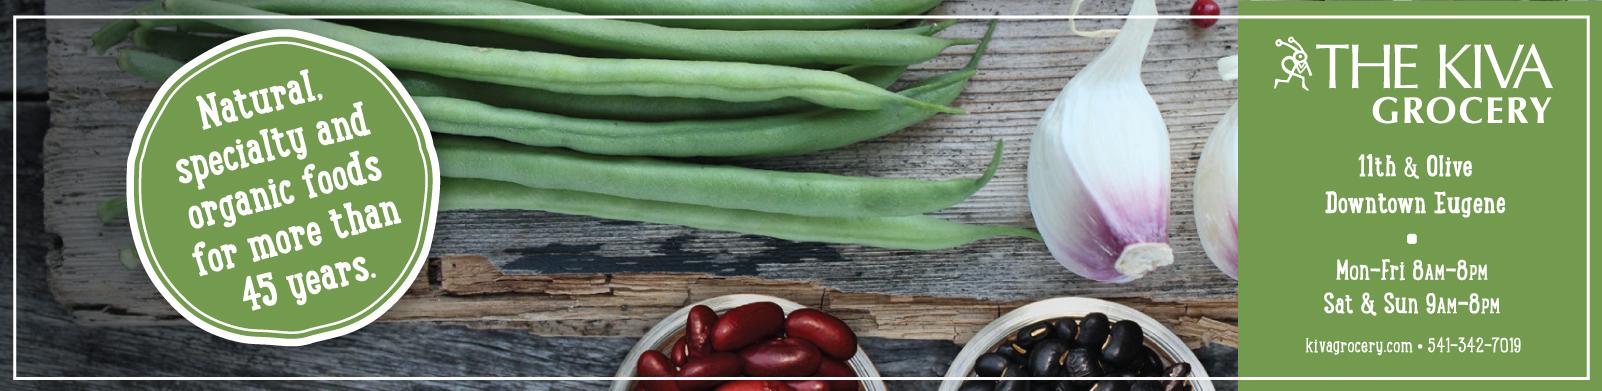 Kiva grocery ad